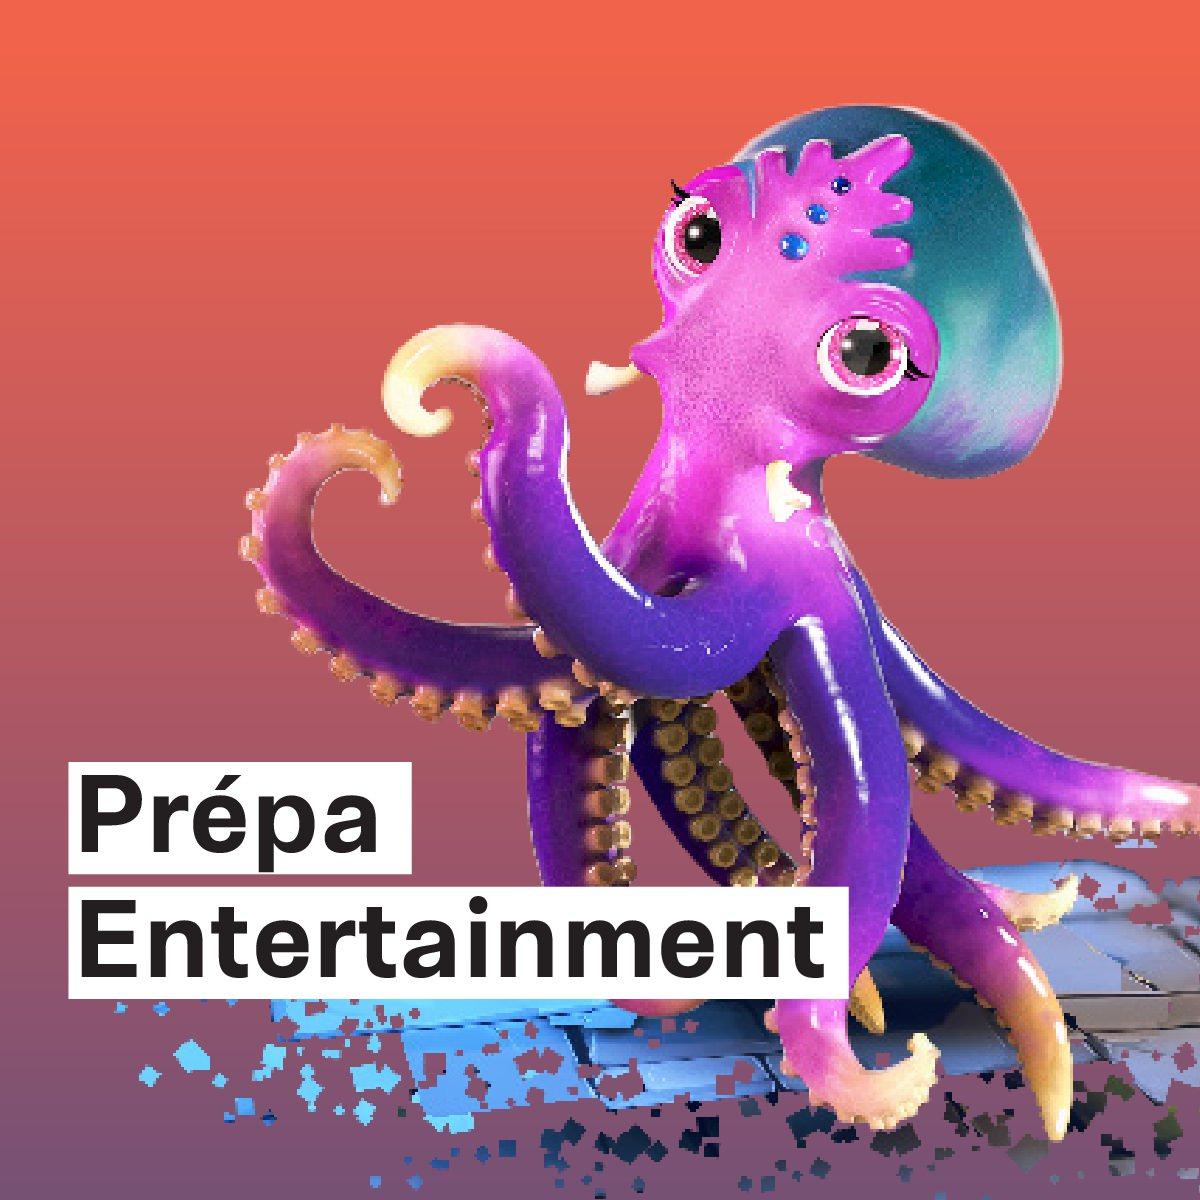 Bellecour Ecole - Prépa Entertainment